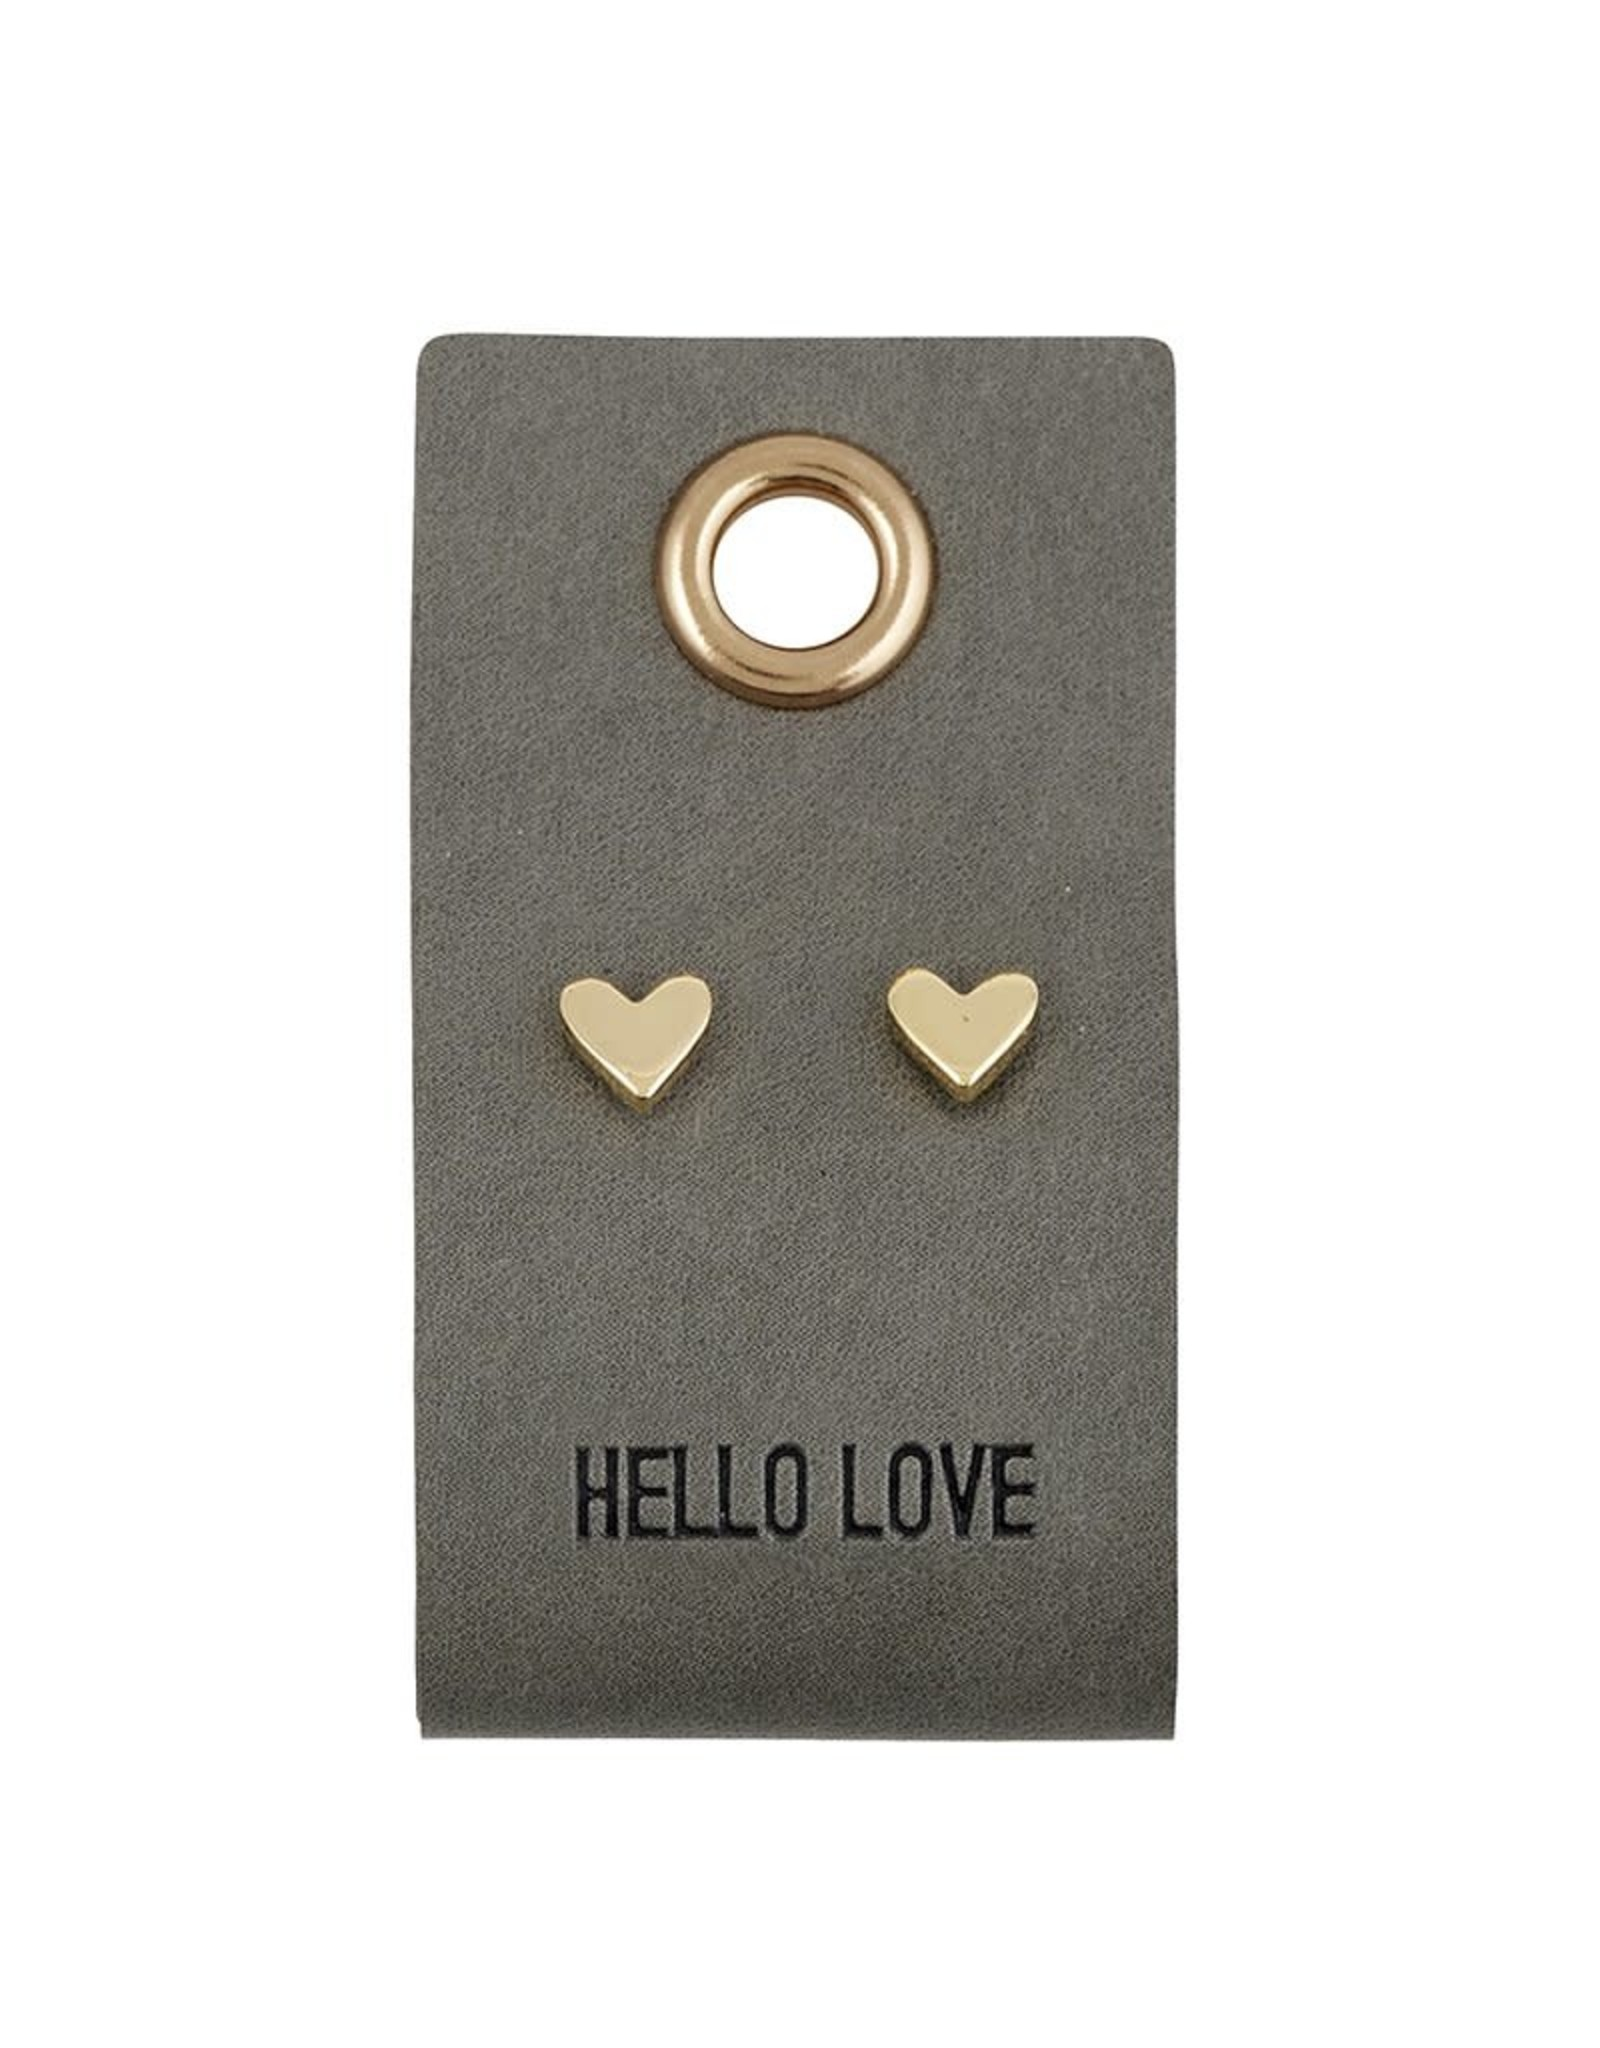 Leather Tag w/Earrings - Heart